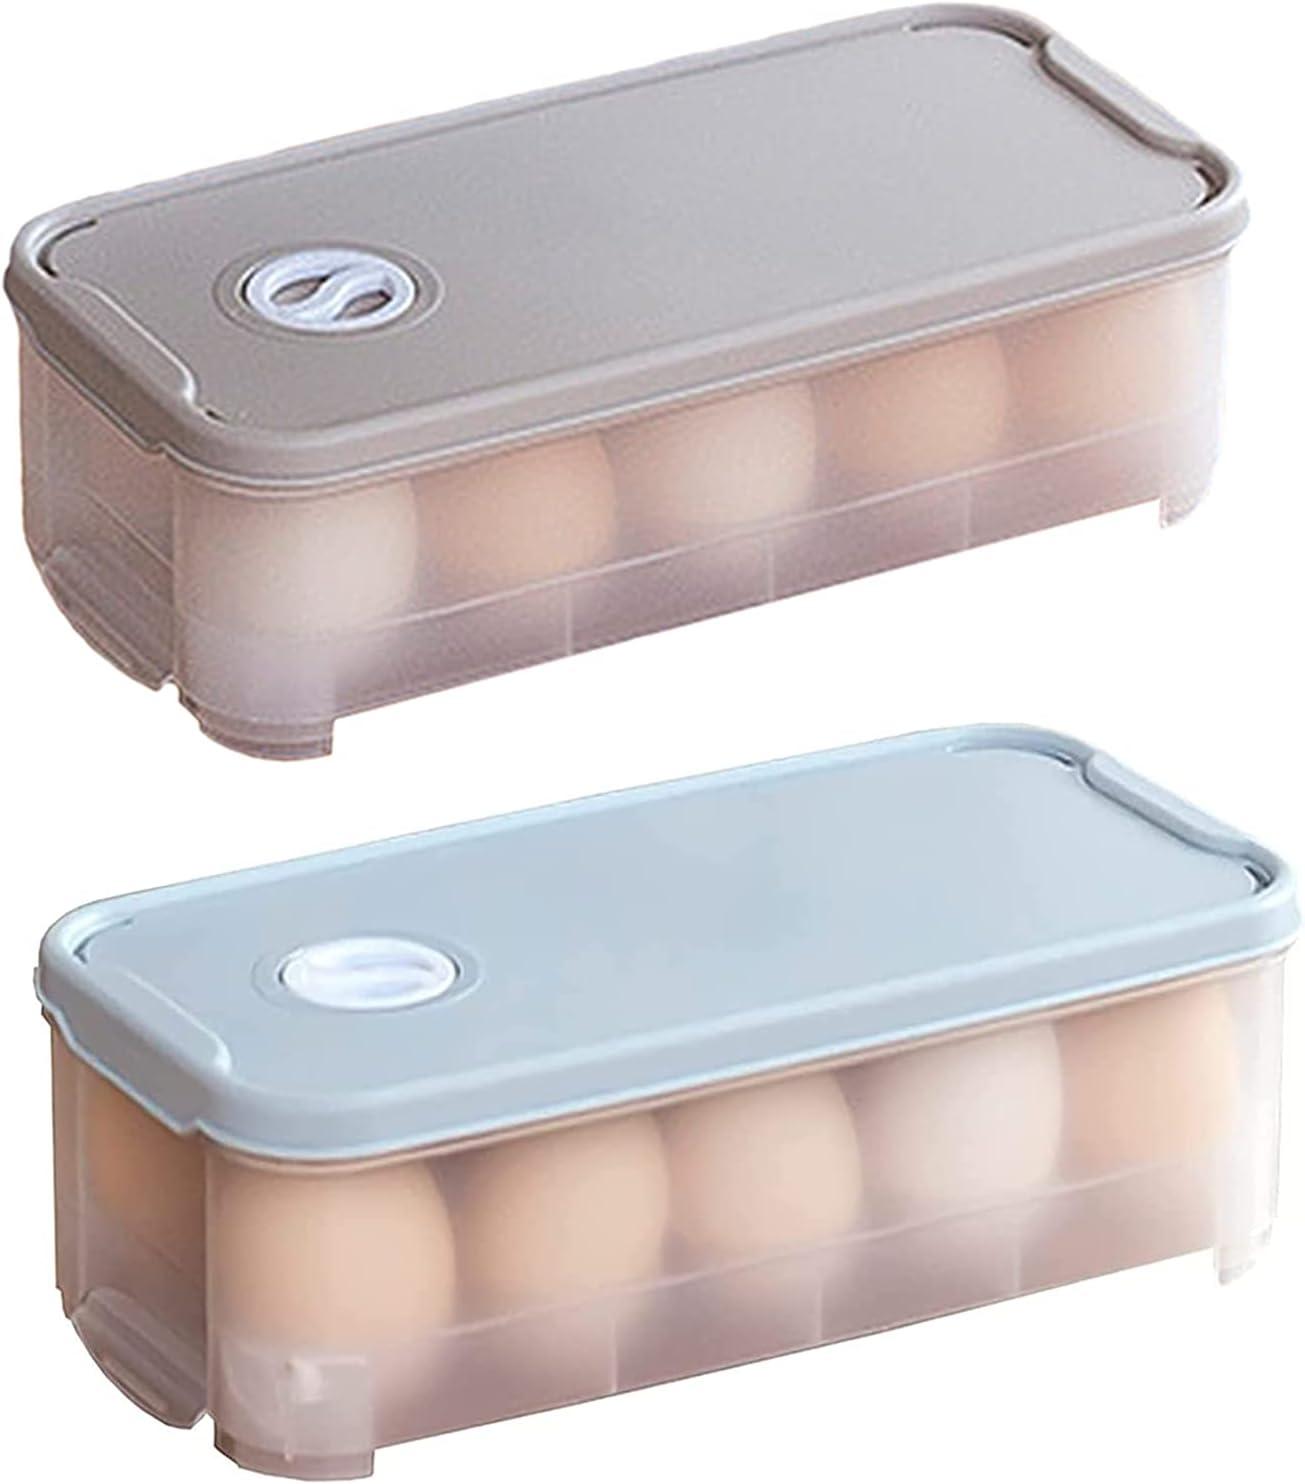 Gloryit 2 Piezas contenedor huevos caja de almacenamiento para huevos soporte portátil para huevos,Huevera para de plástico con tapa para Aplicar para Nevera Senderismo Acampada Picnic Aire Libre